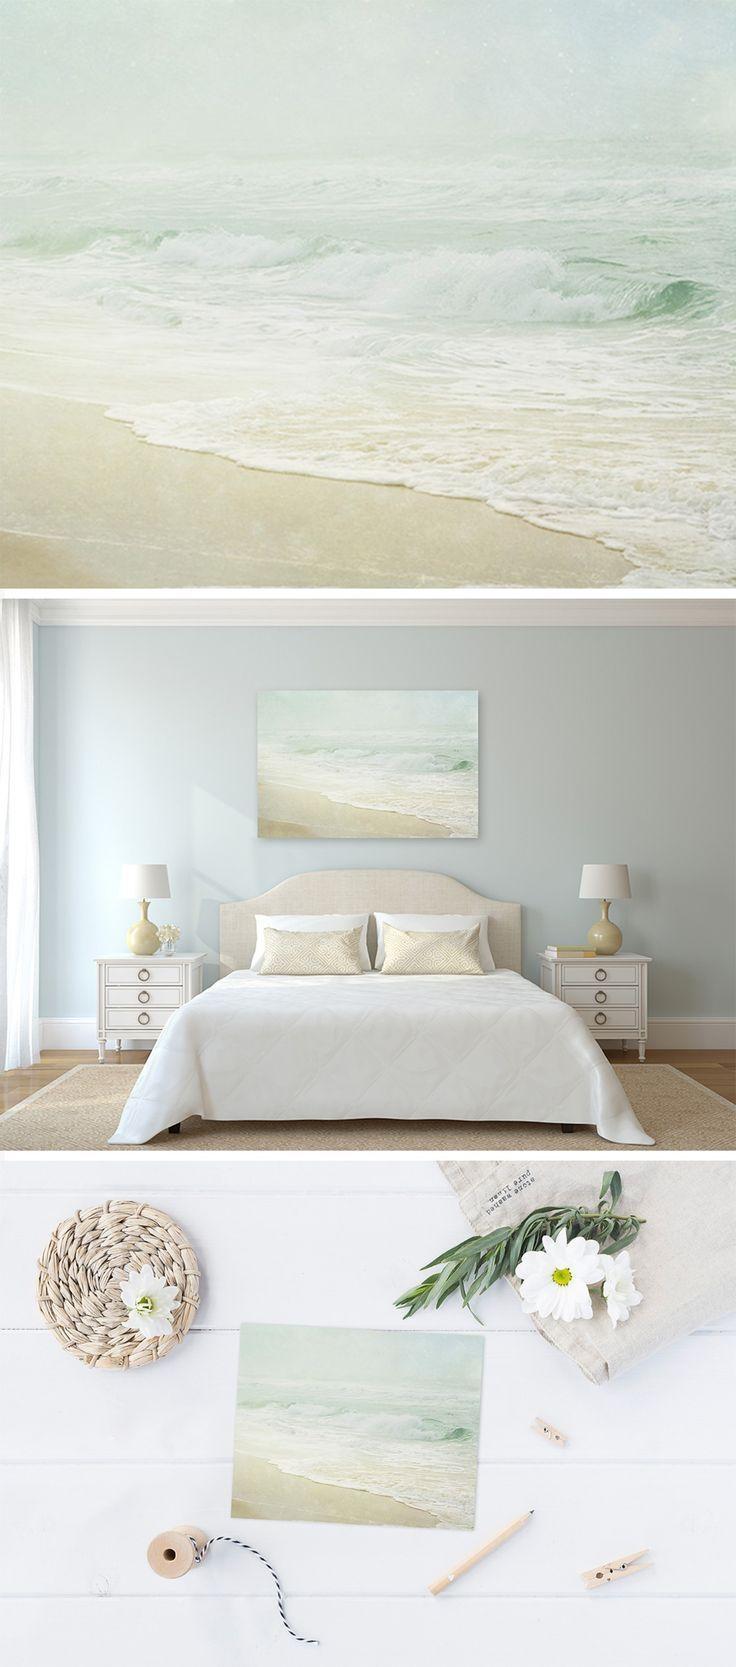 Best 25+ Coastal Wall Art Ideas On Pinterest | Coastal Inspired Regarding Beach Theme Wall Art (View 13 of 20)